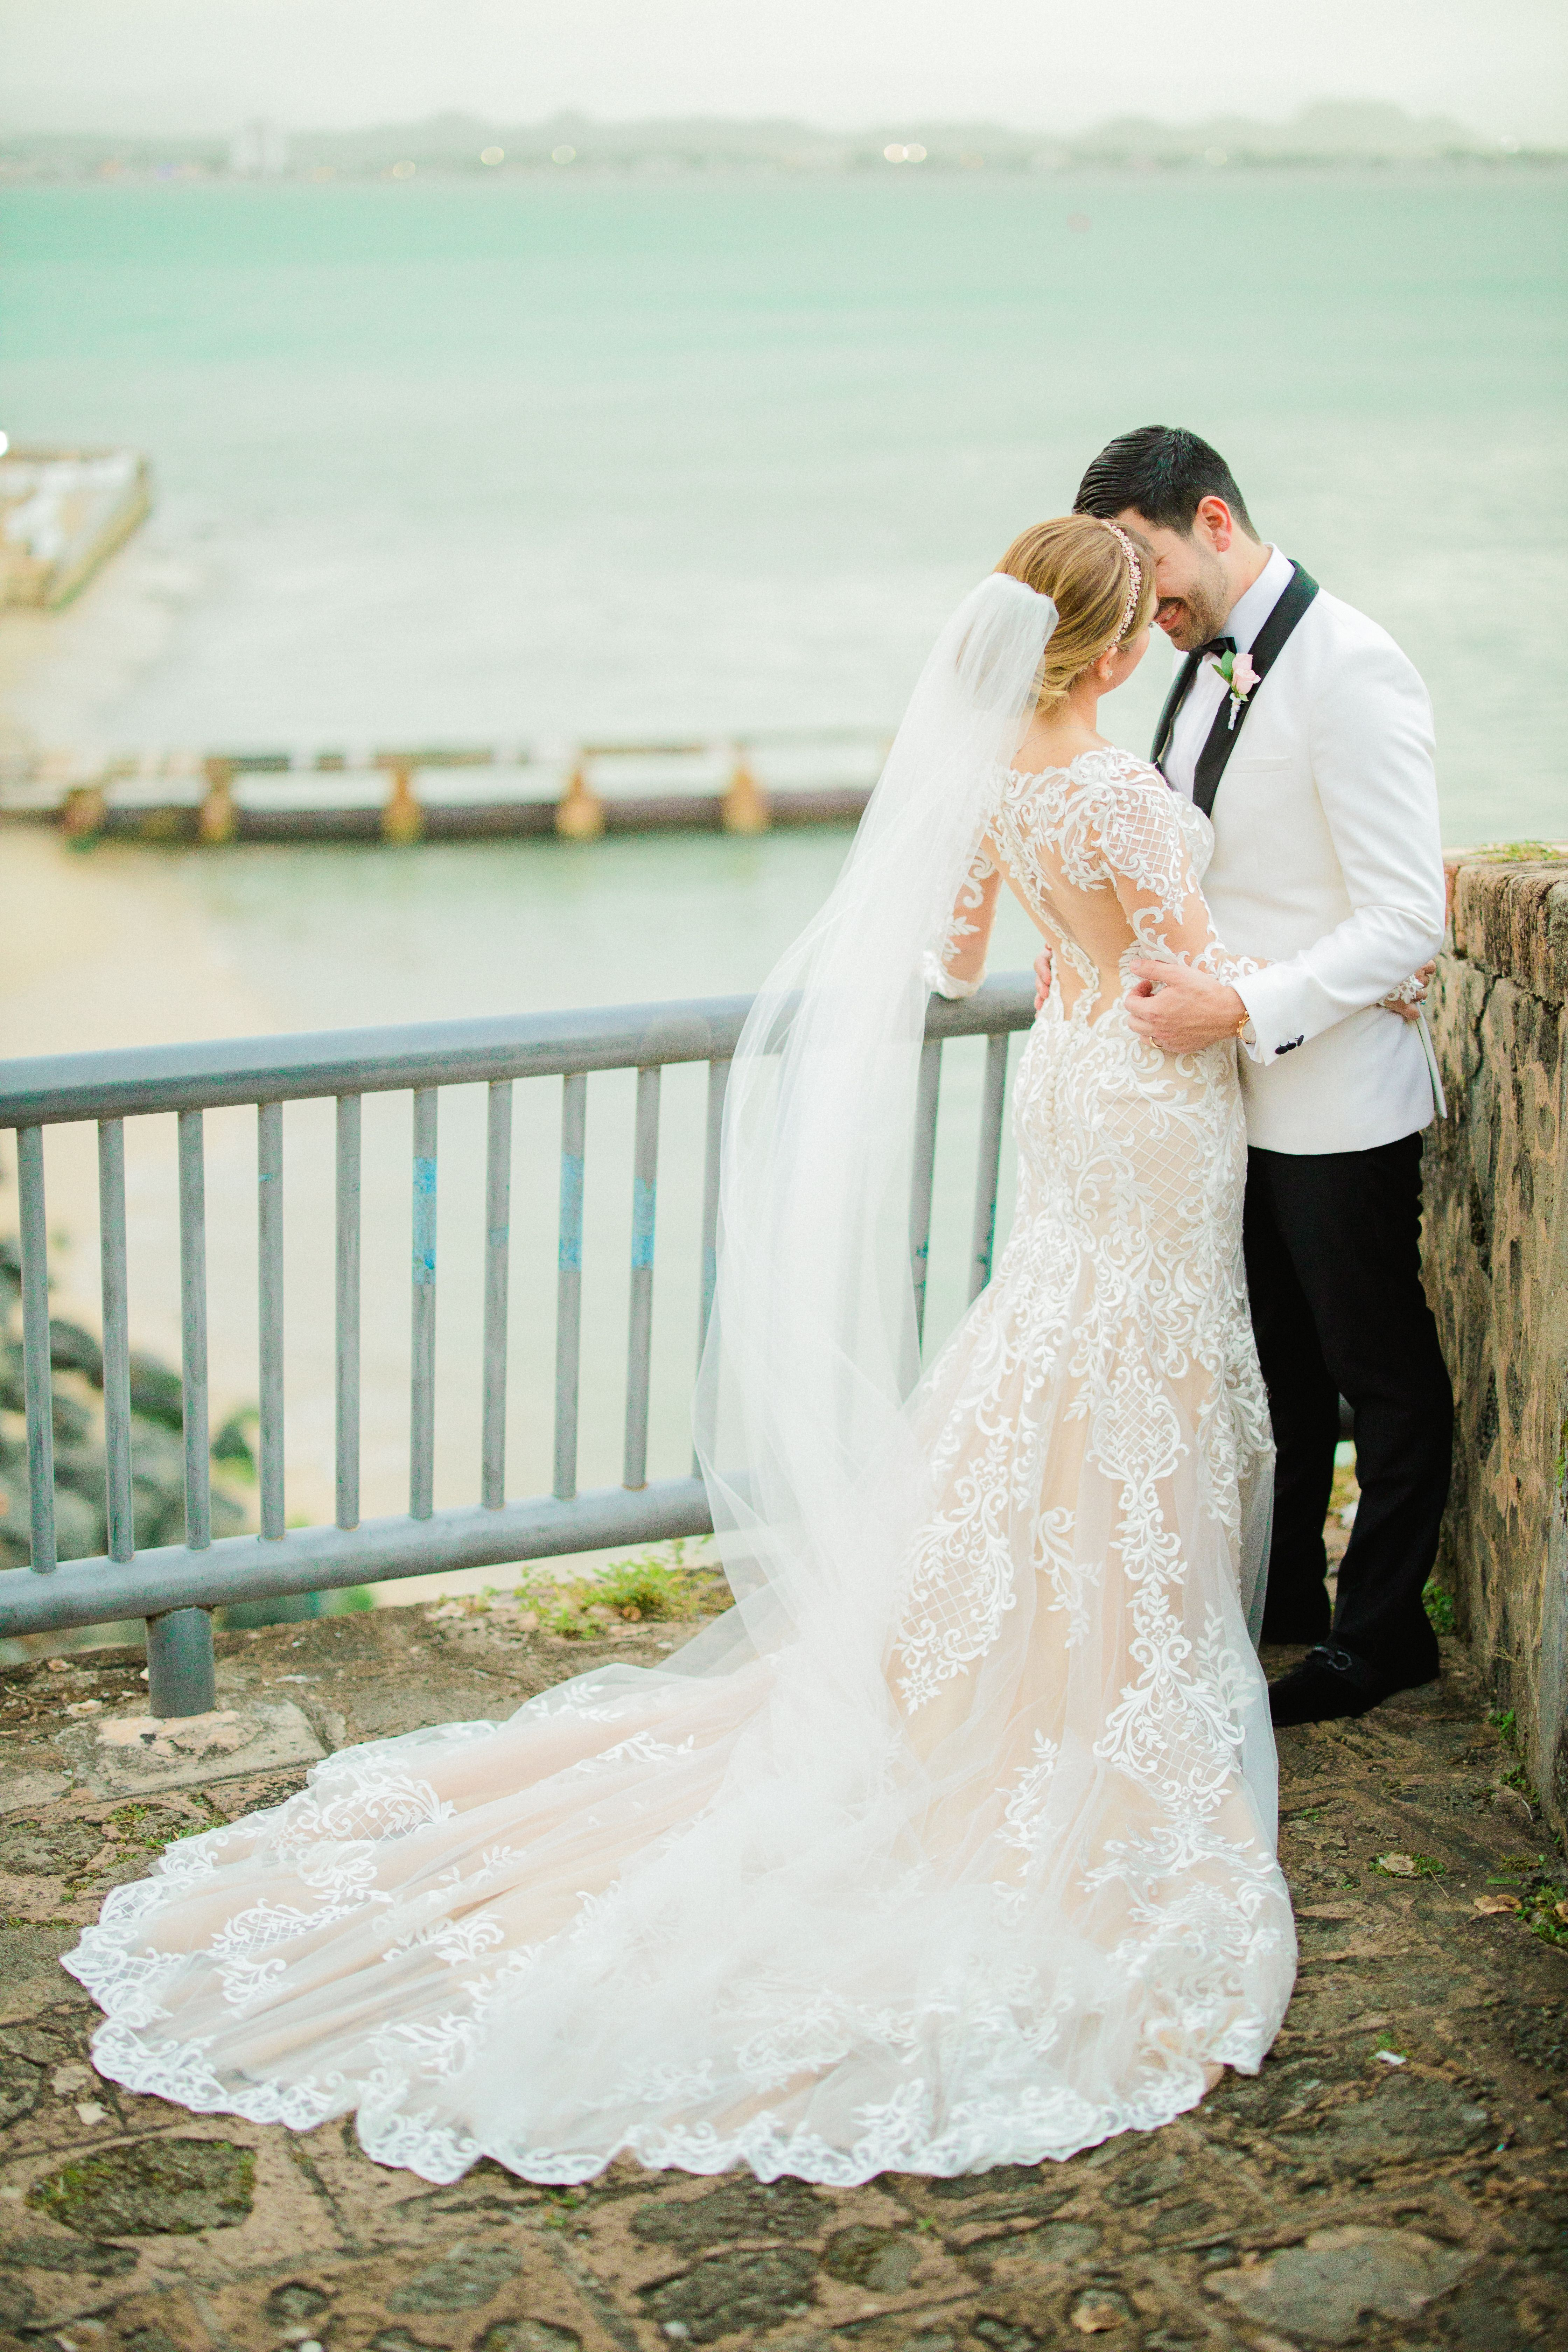 Fotos: Vanessa Velez. Vídeo: Wedding Mafia